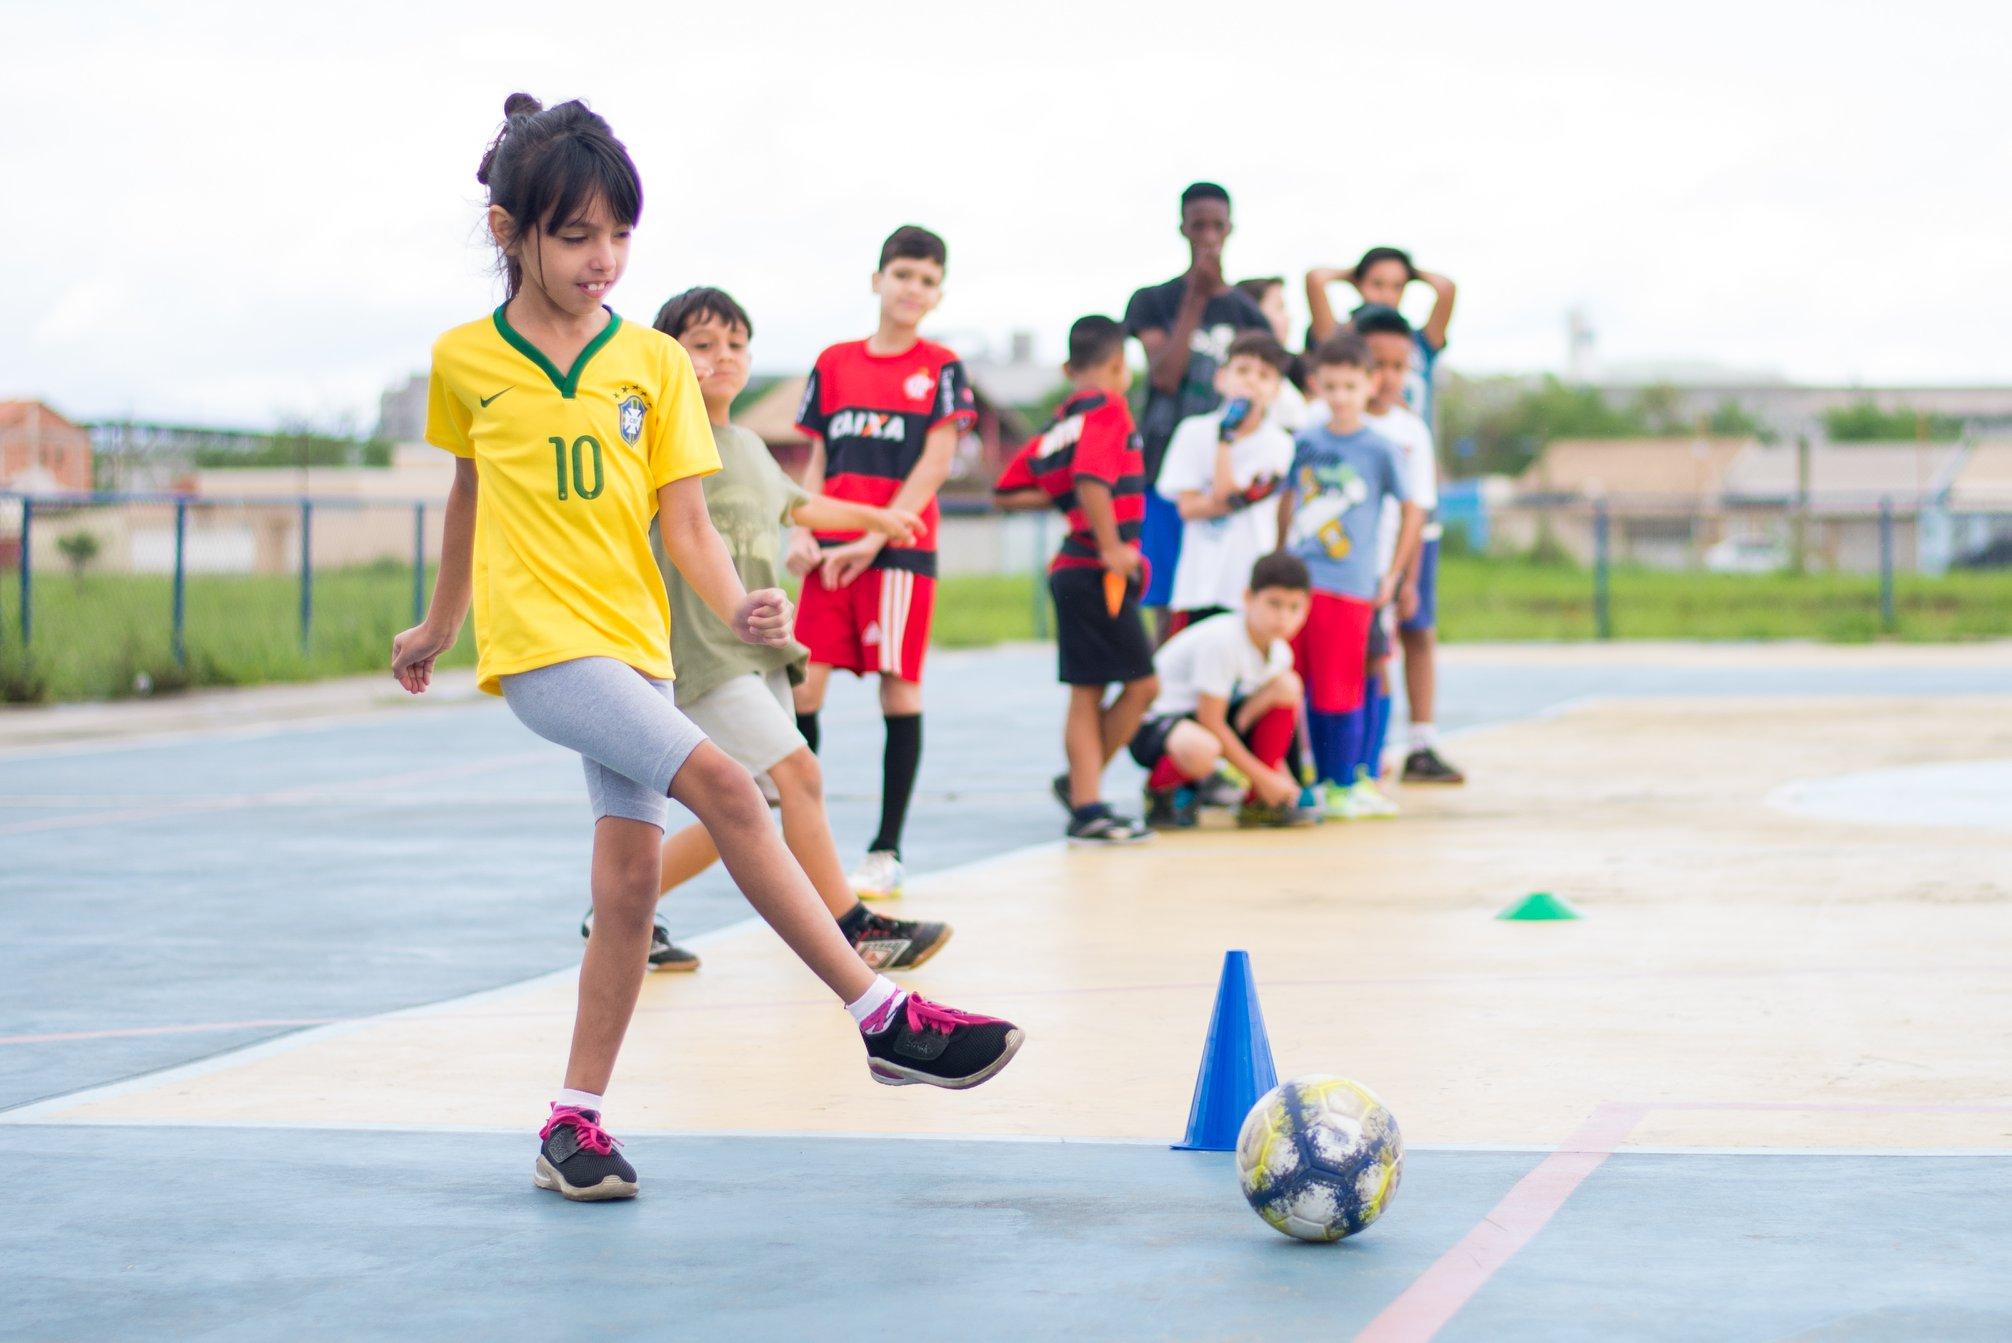 ae7b1731e114e Projeto de Futsal promove aula inaugural no Jardim Aliança II, em Resende